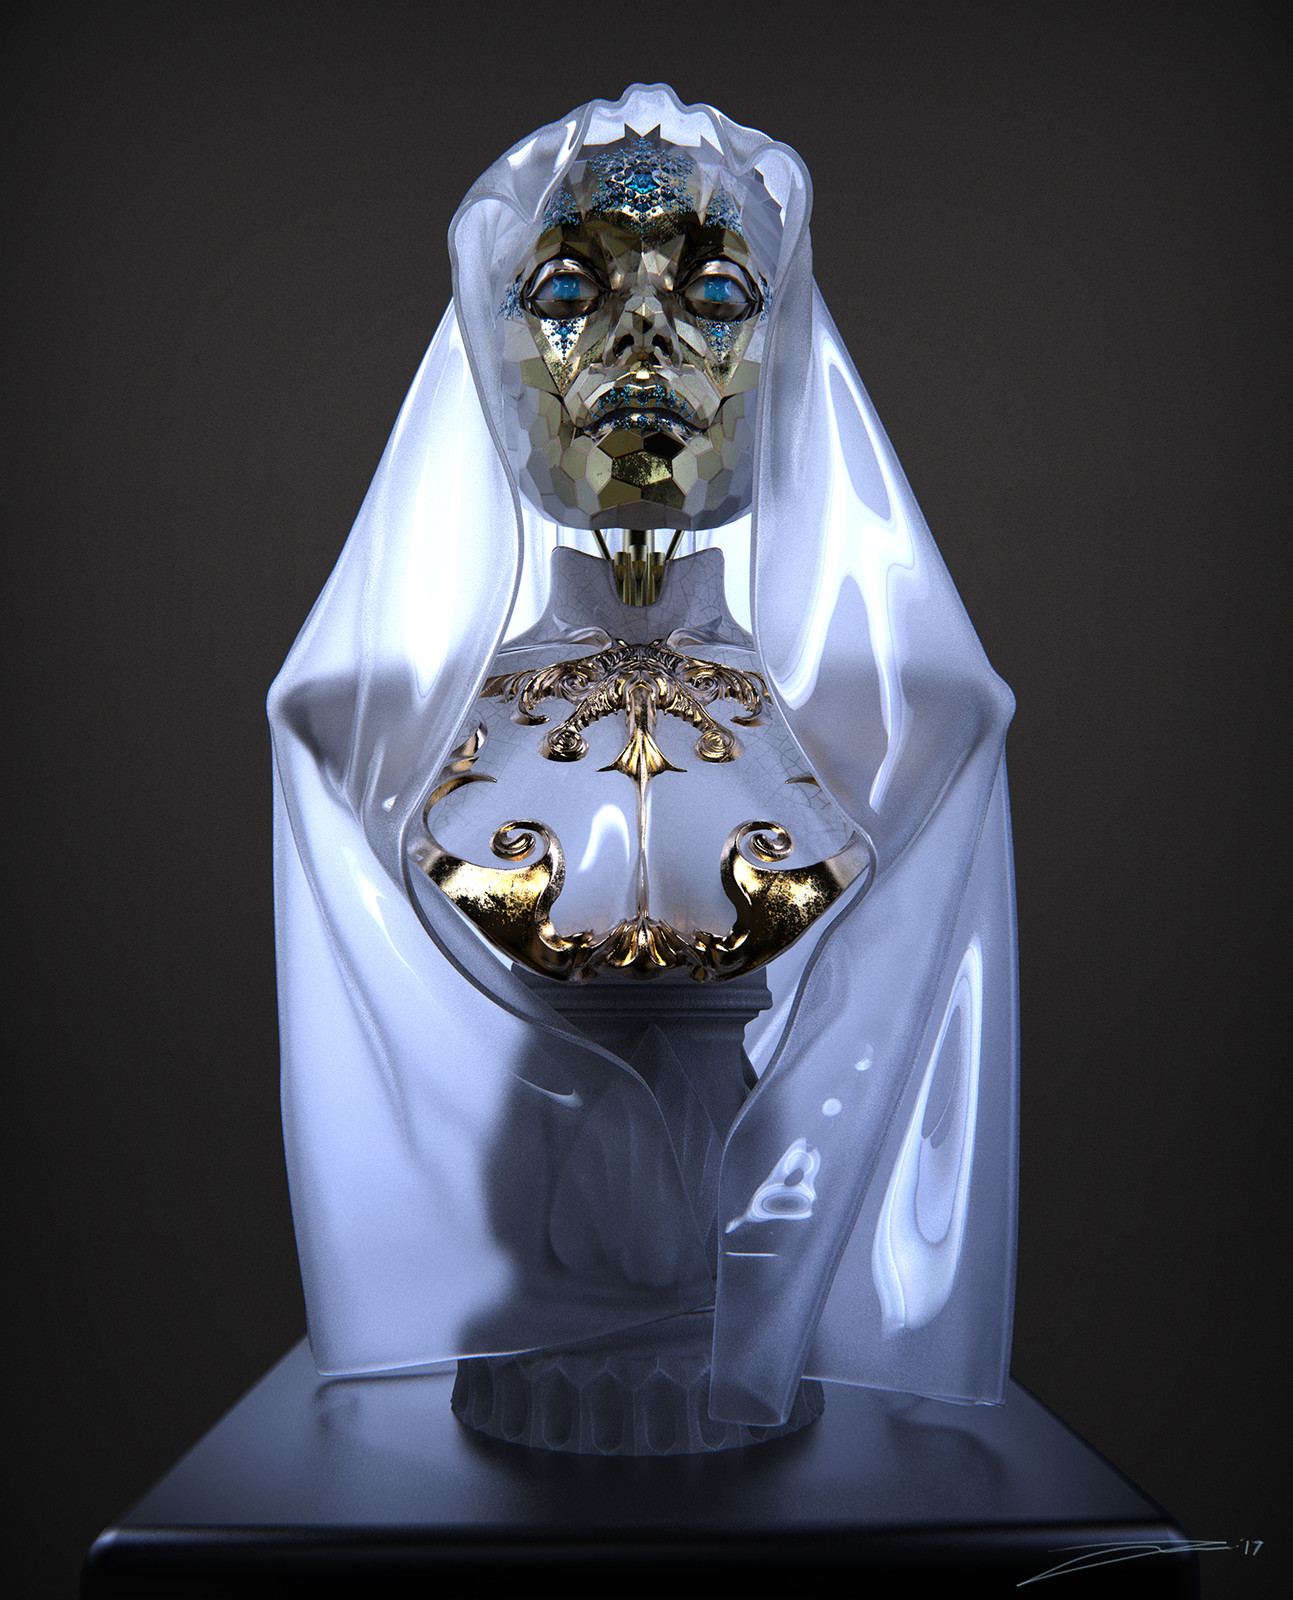 Our Lady of Global Illumination (AKA Wintermute)